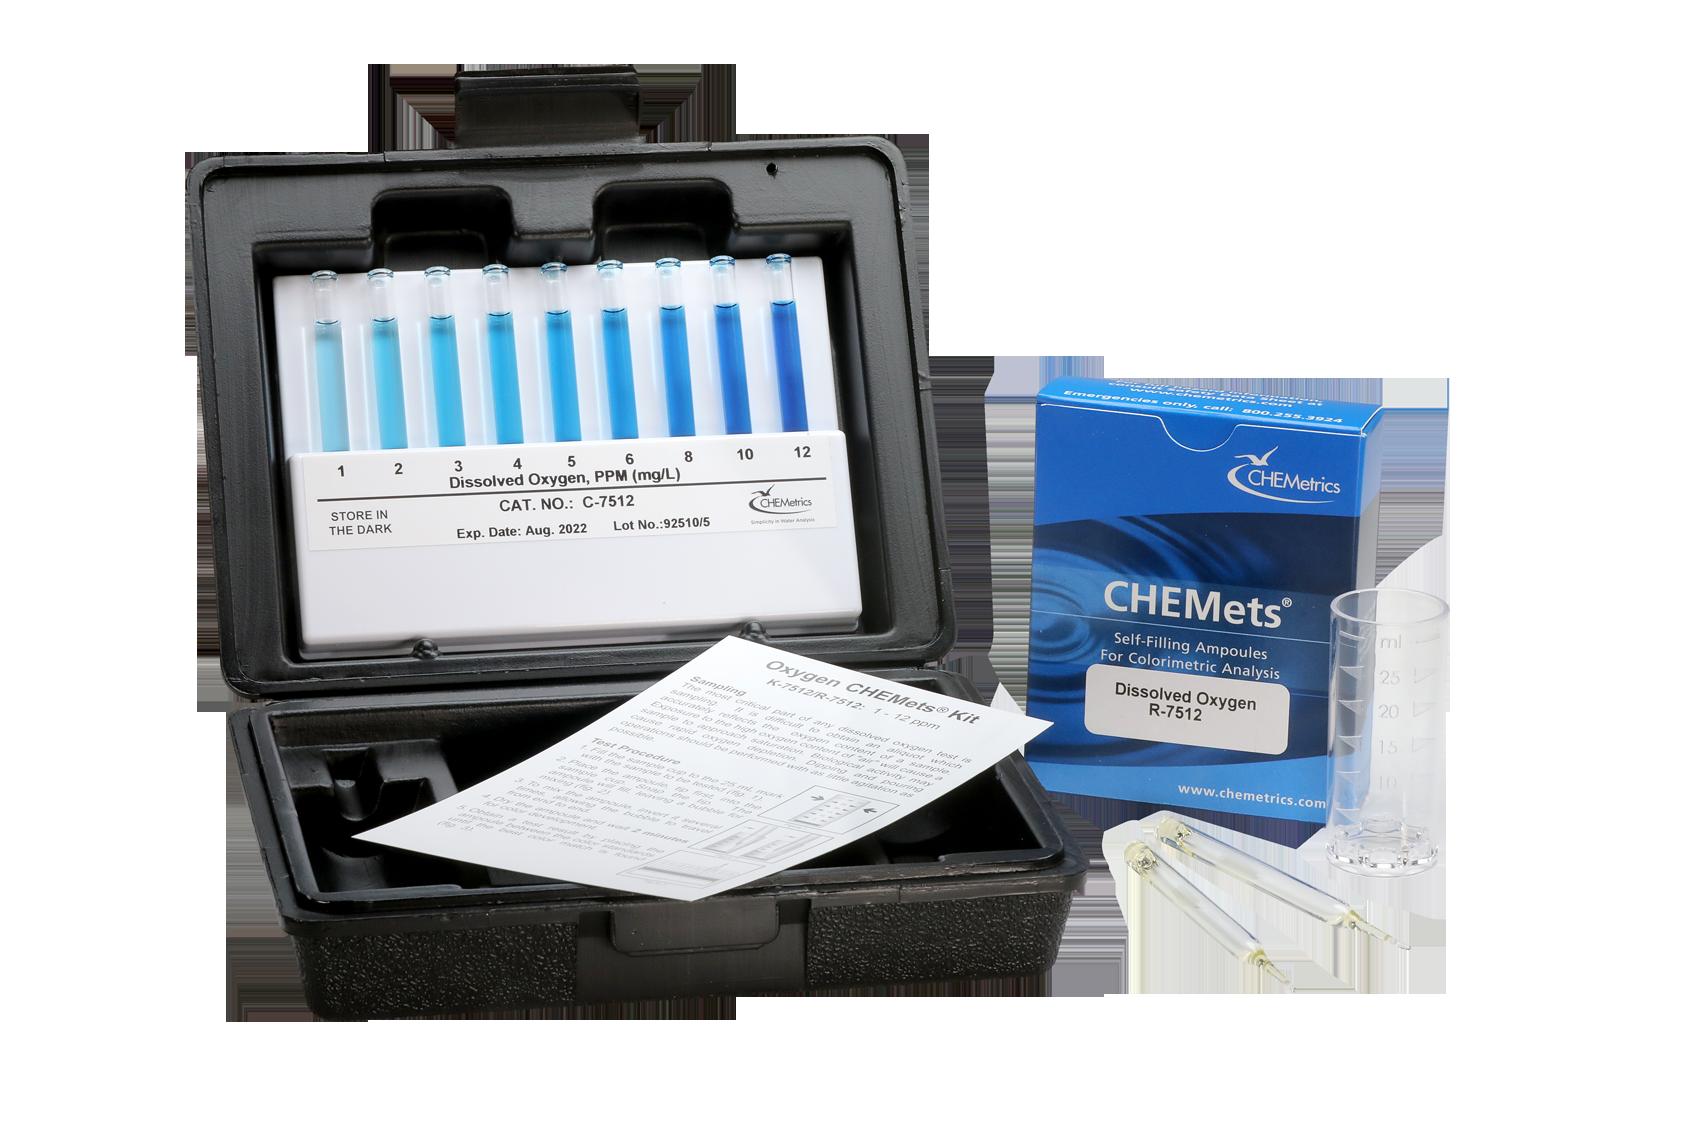 CHEMetrics K-7512 Dissolved Oxygen Test kit and contents